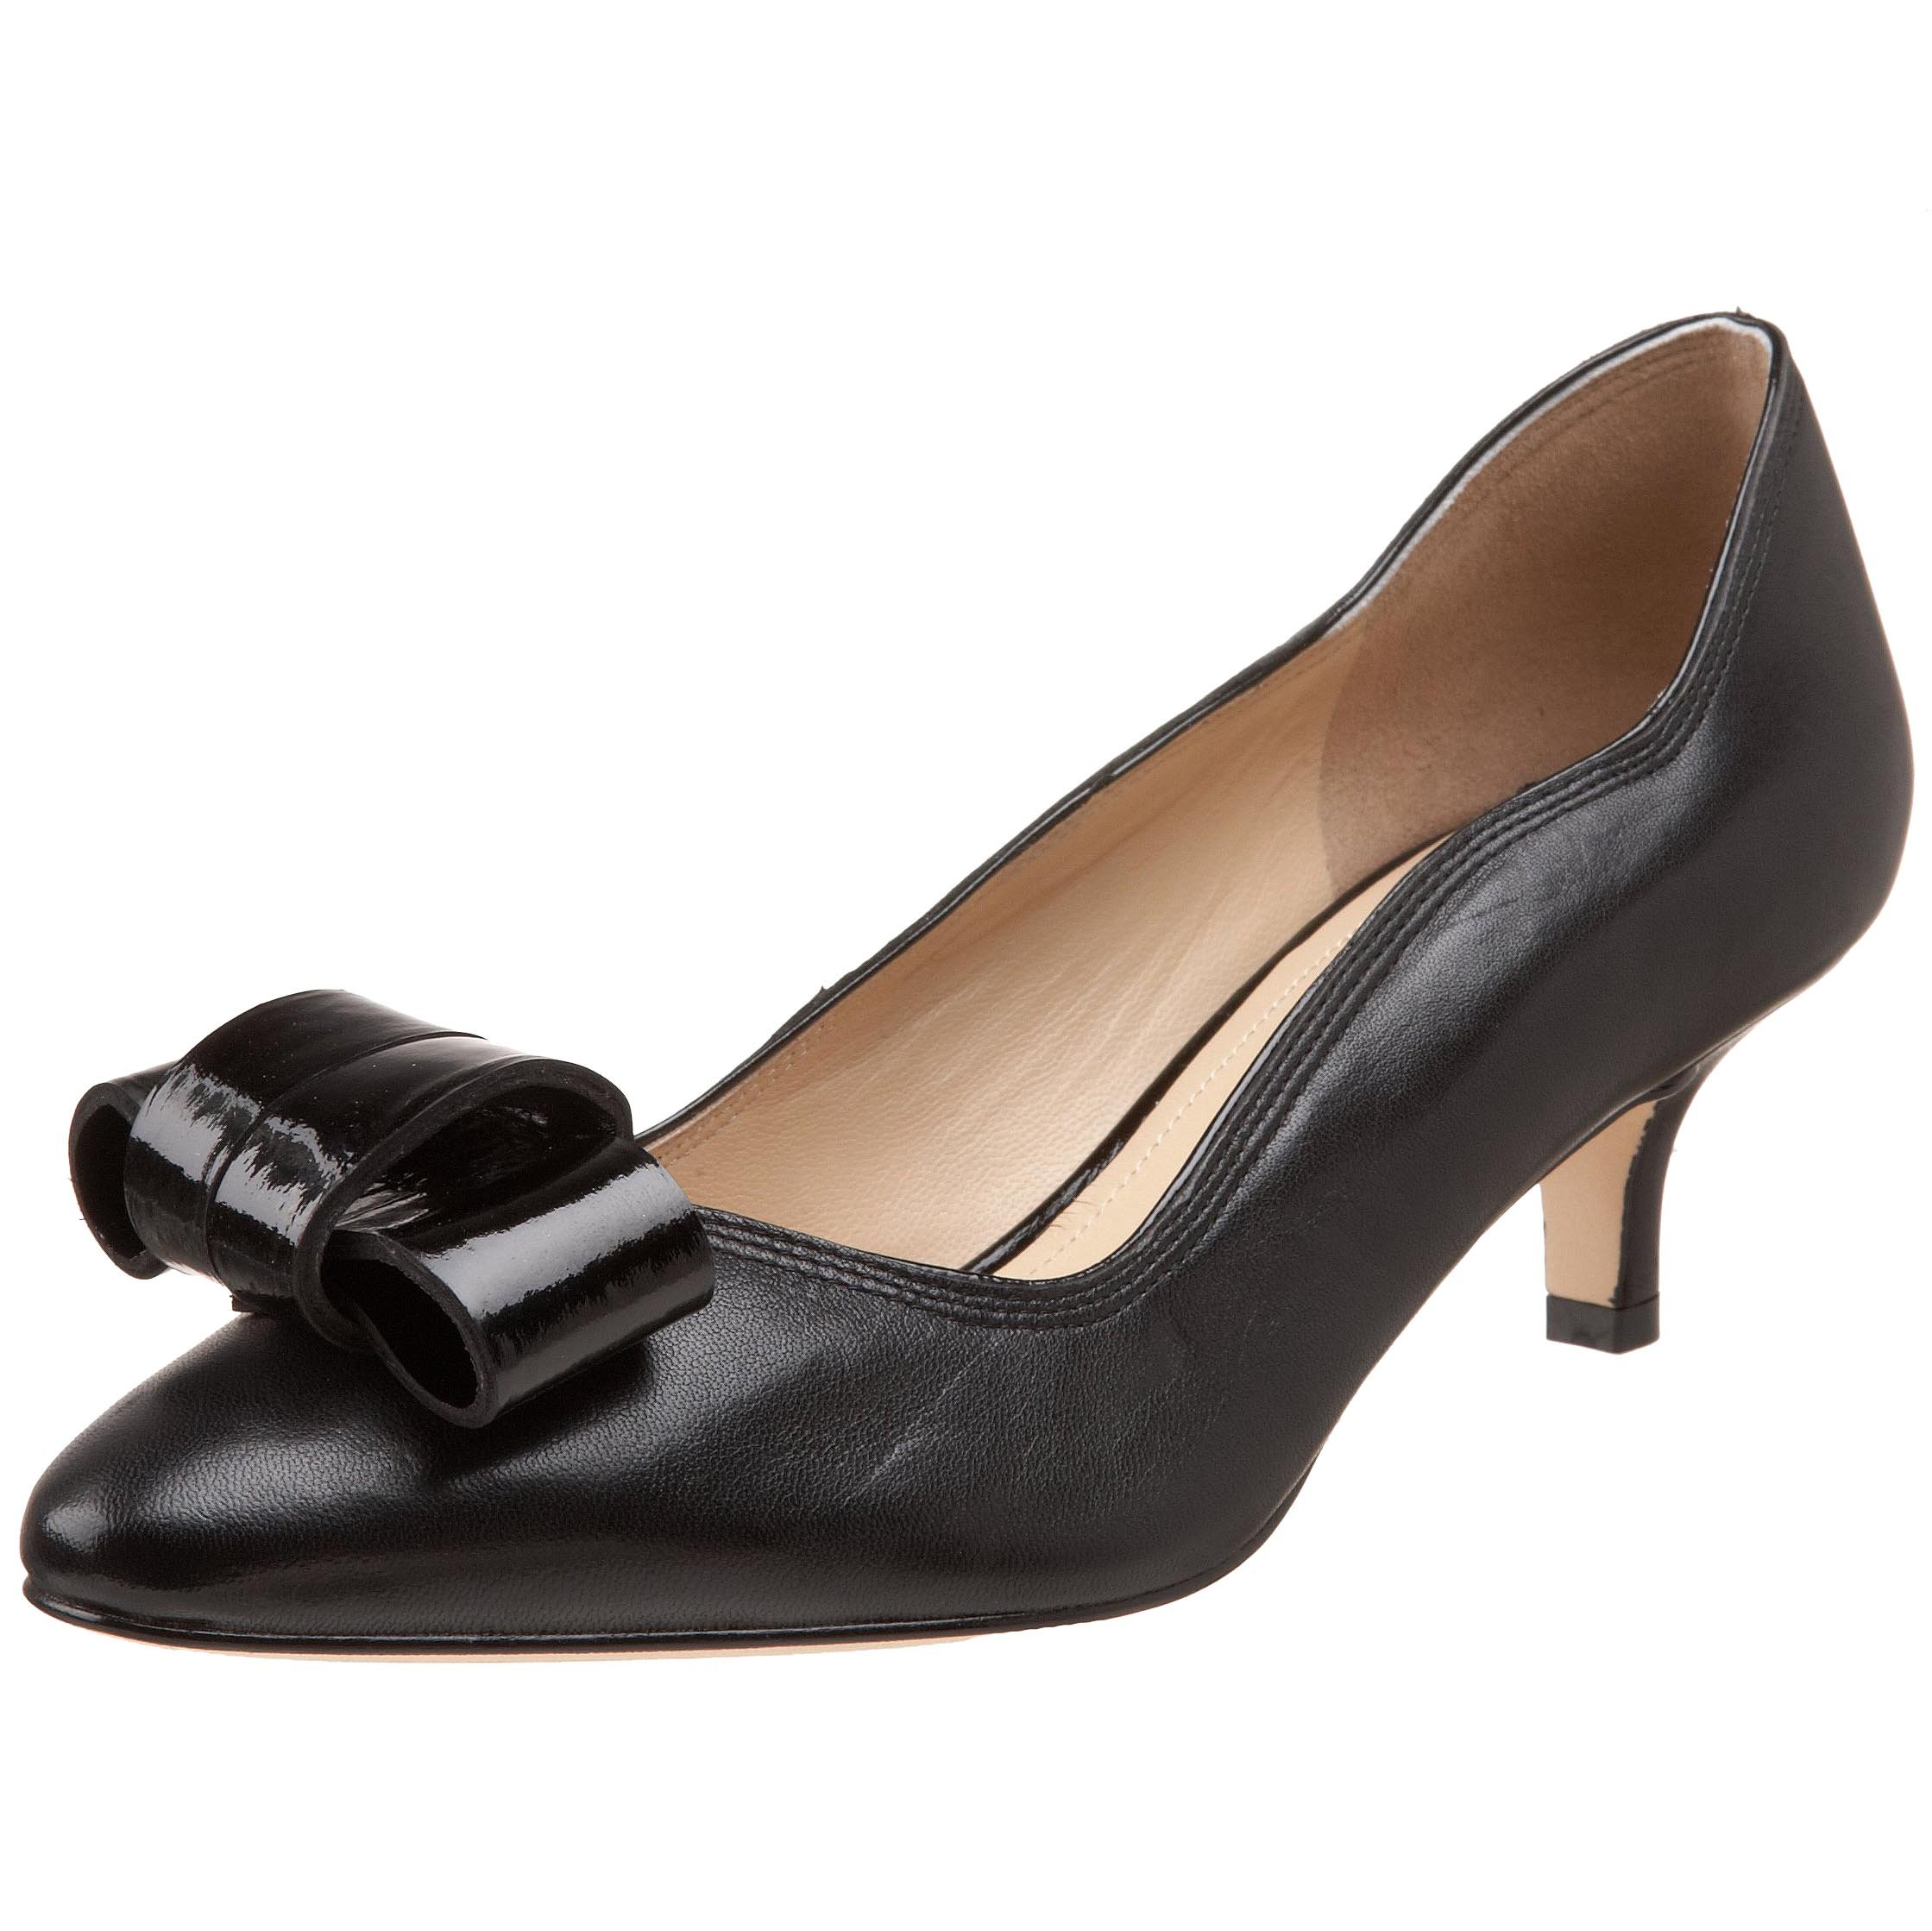 Joan & David Collection Women's Beatriz Pump,Black Leather,7 M US